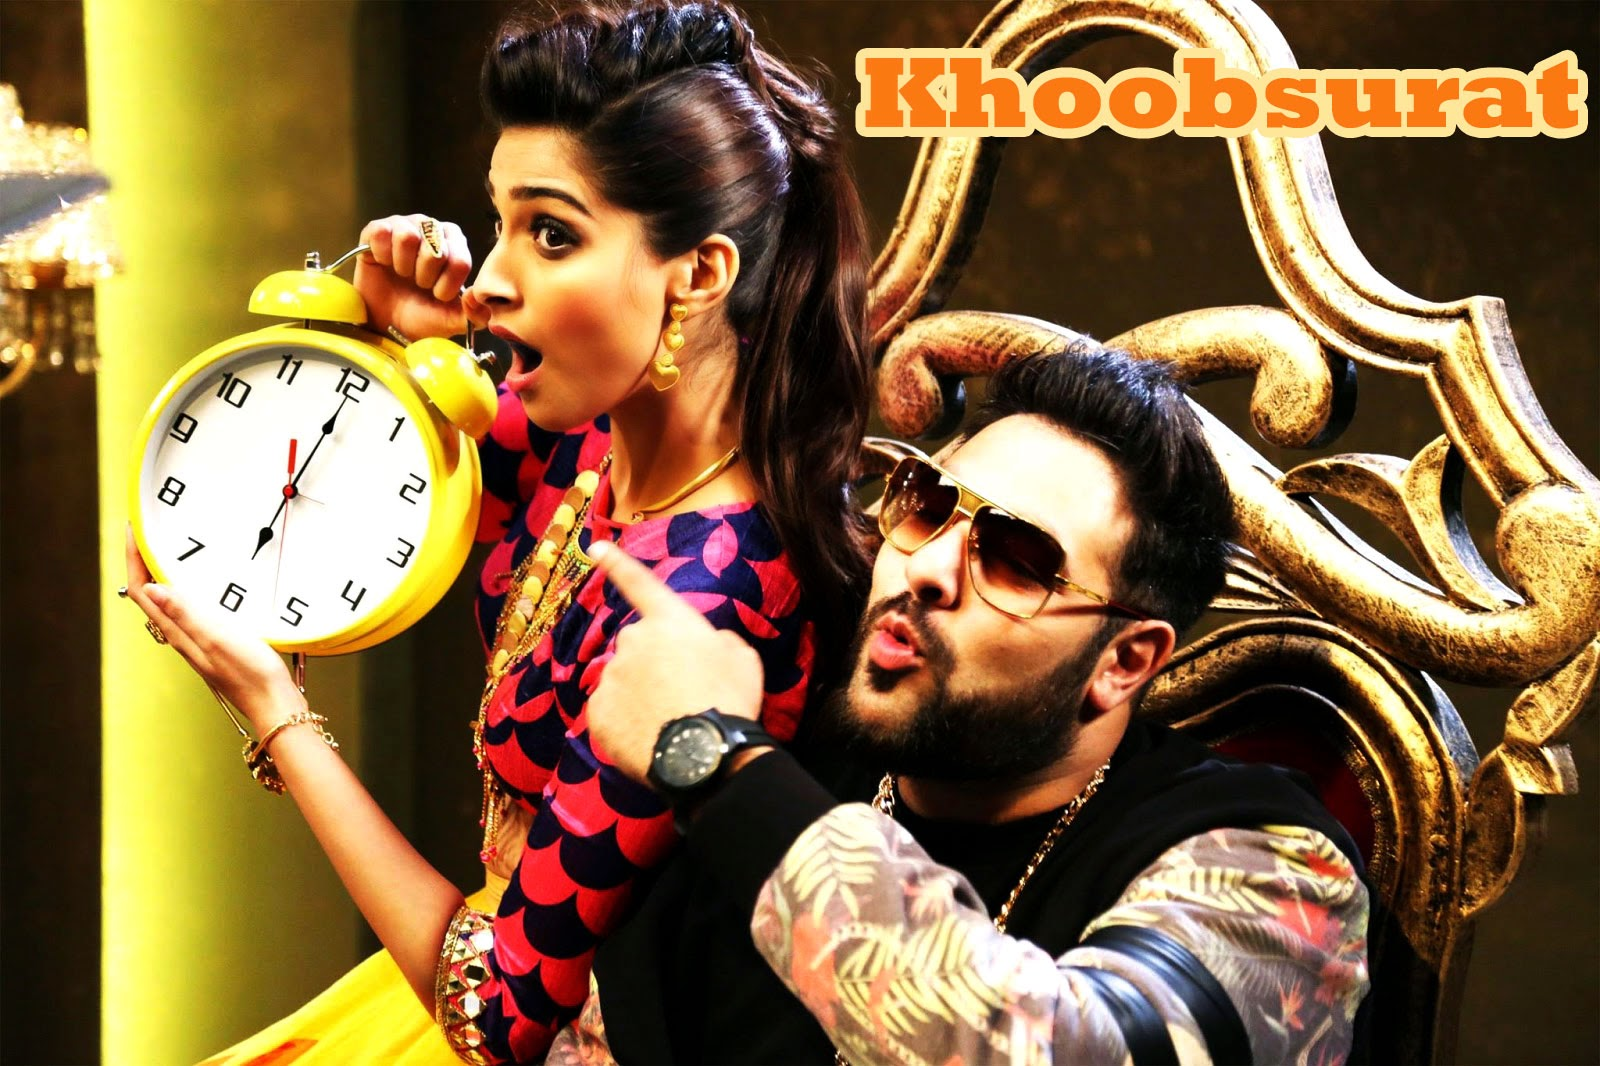 wallpapers station khoobsurat new bollywood movie 2014